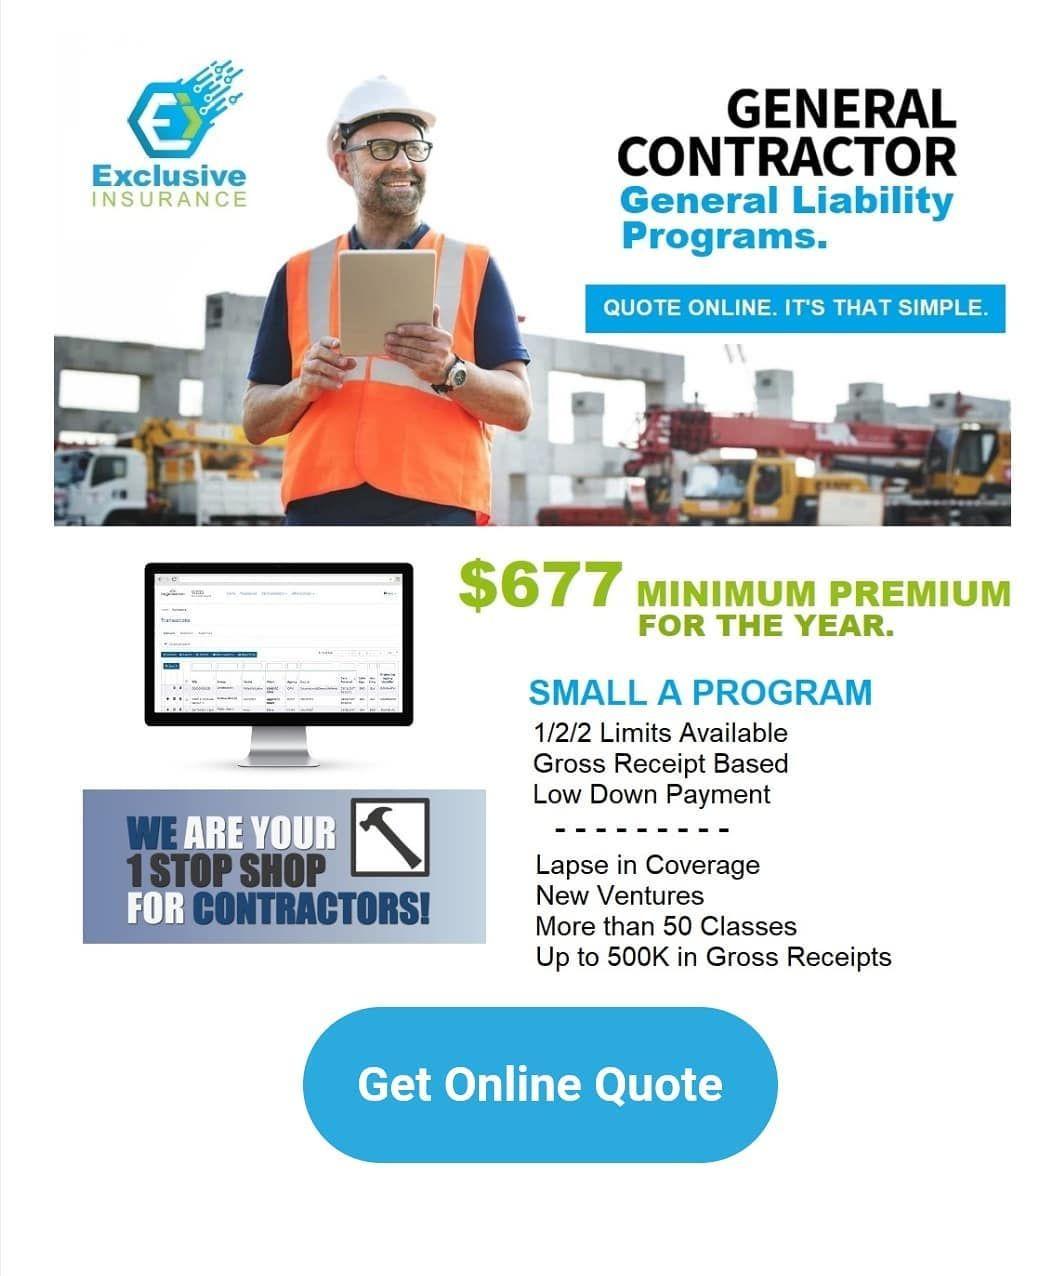 njcontractor insurancebroker General liability, Car